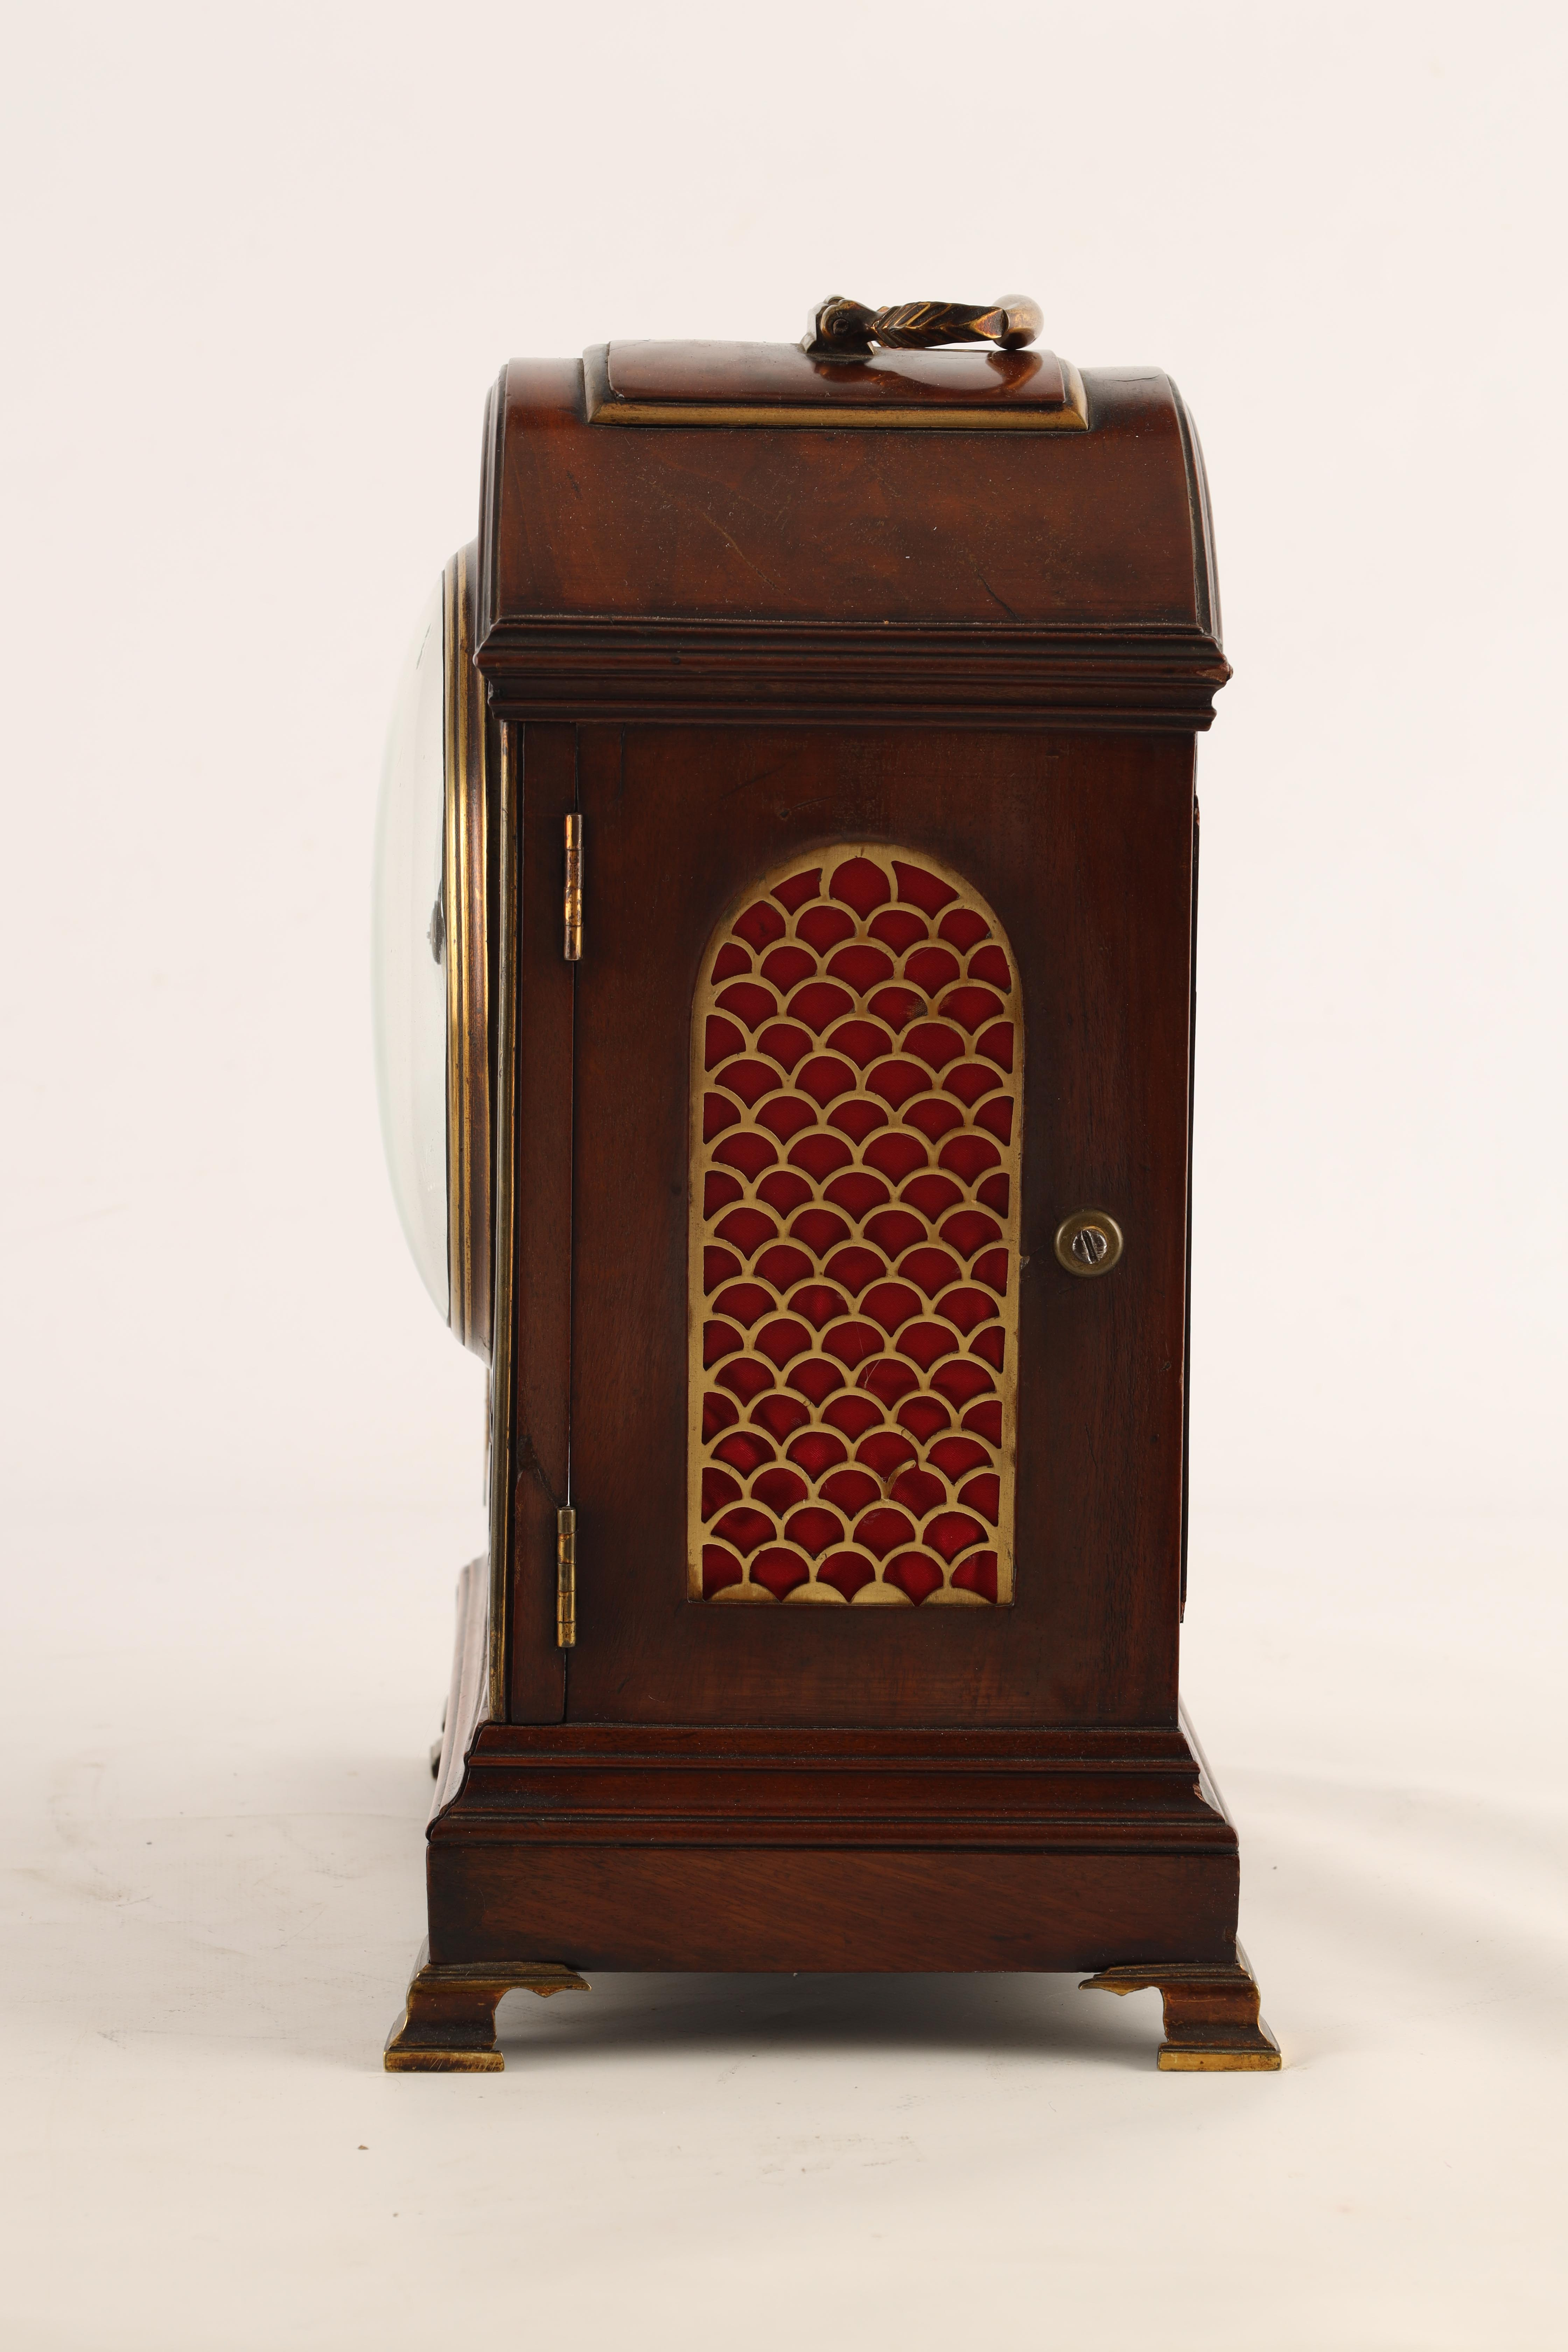 JOHN DOBBS, LONDON A LATE GEORGE III MAHOGANY VERGE BRACKET CLOCK the figured mahogany case with - Image 8 of 8